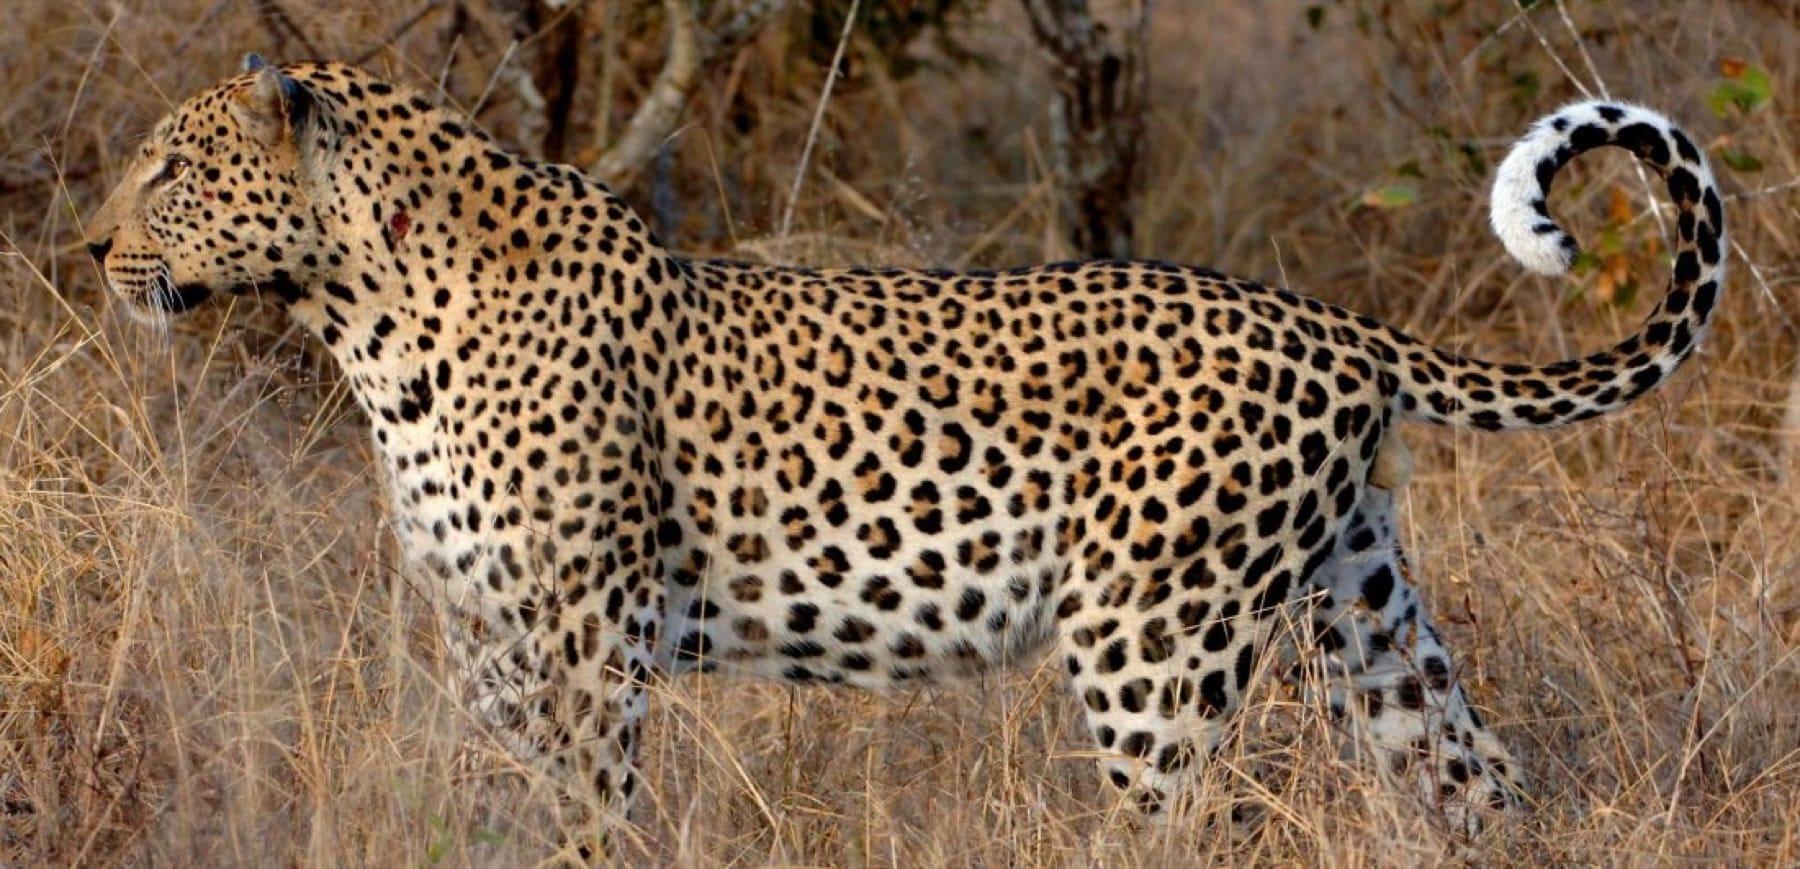 The intrepid leopard botswana wildlife safari